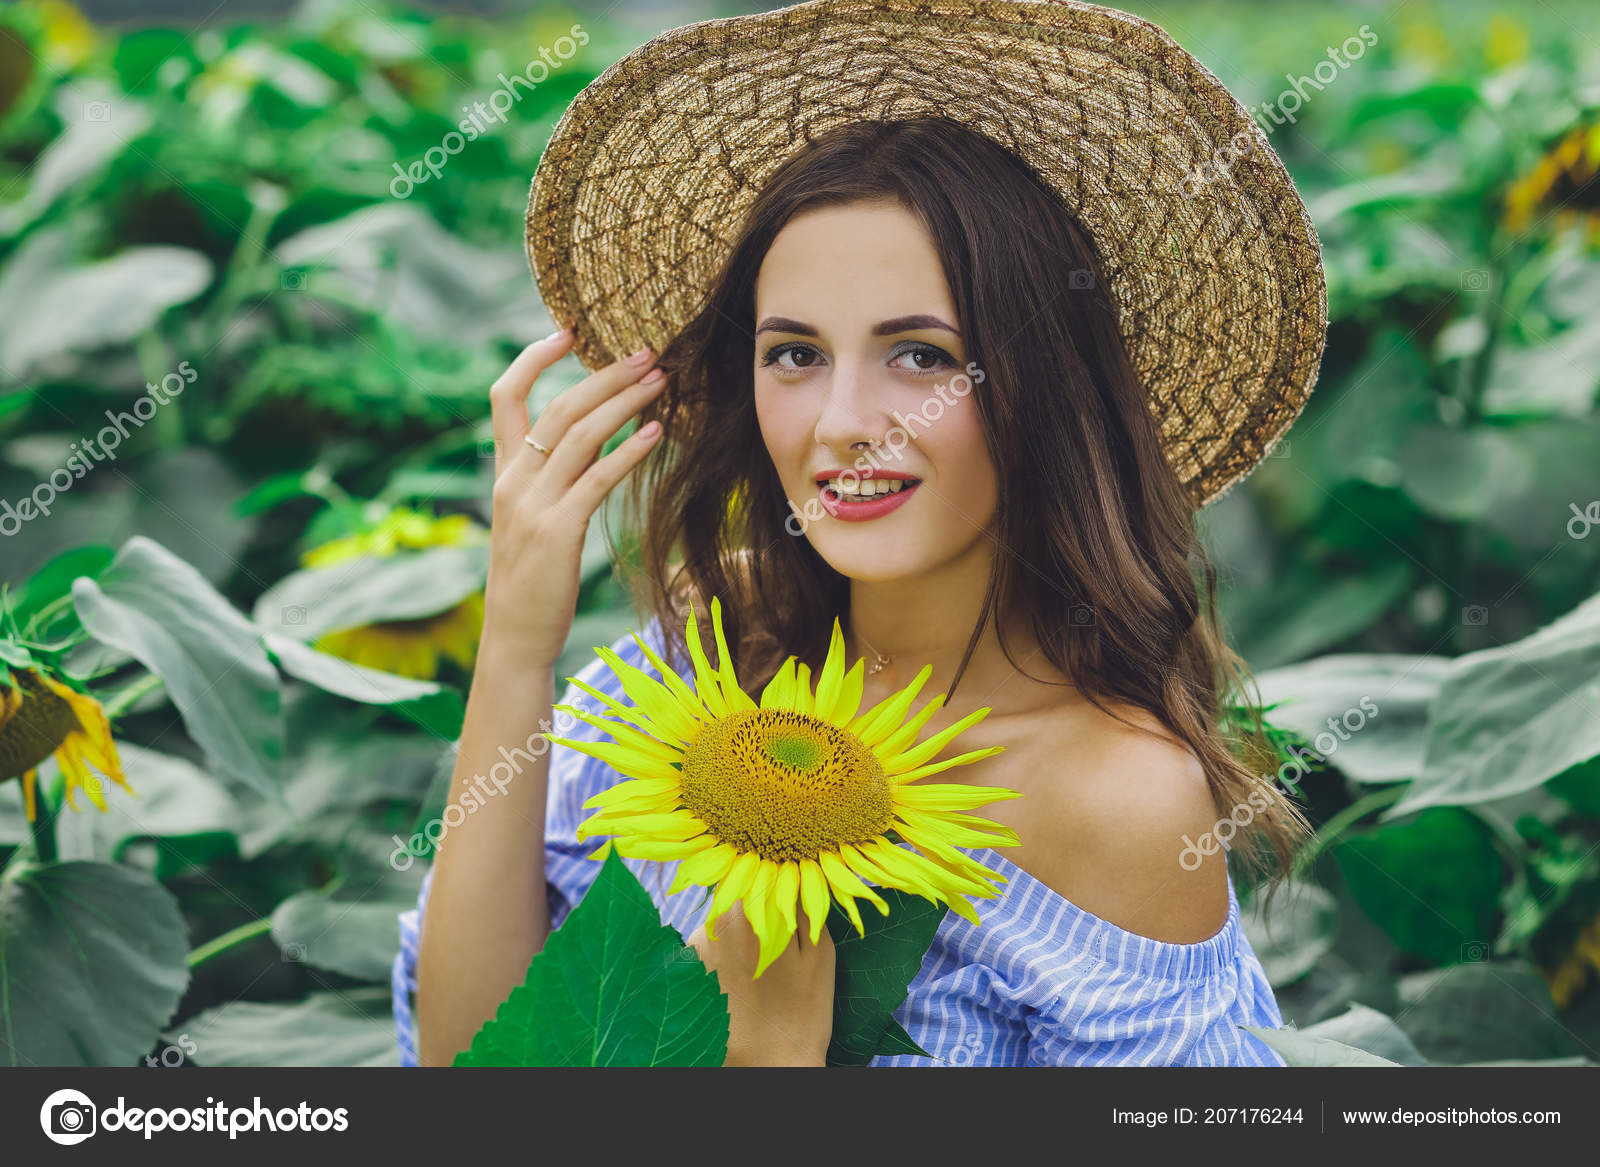 Young Beautiful Girl Dress Hat Field Sunflowers Stock Photo